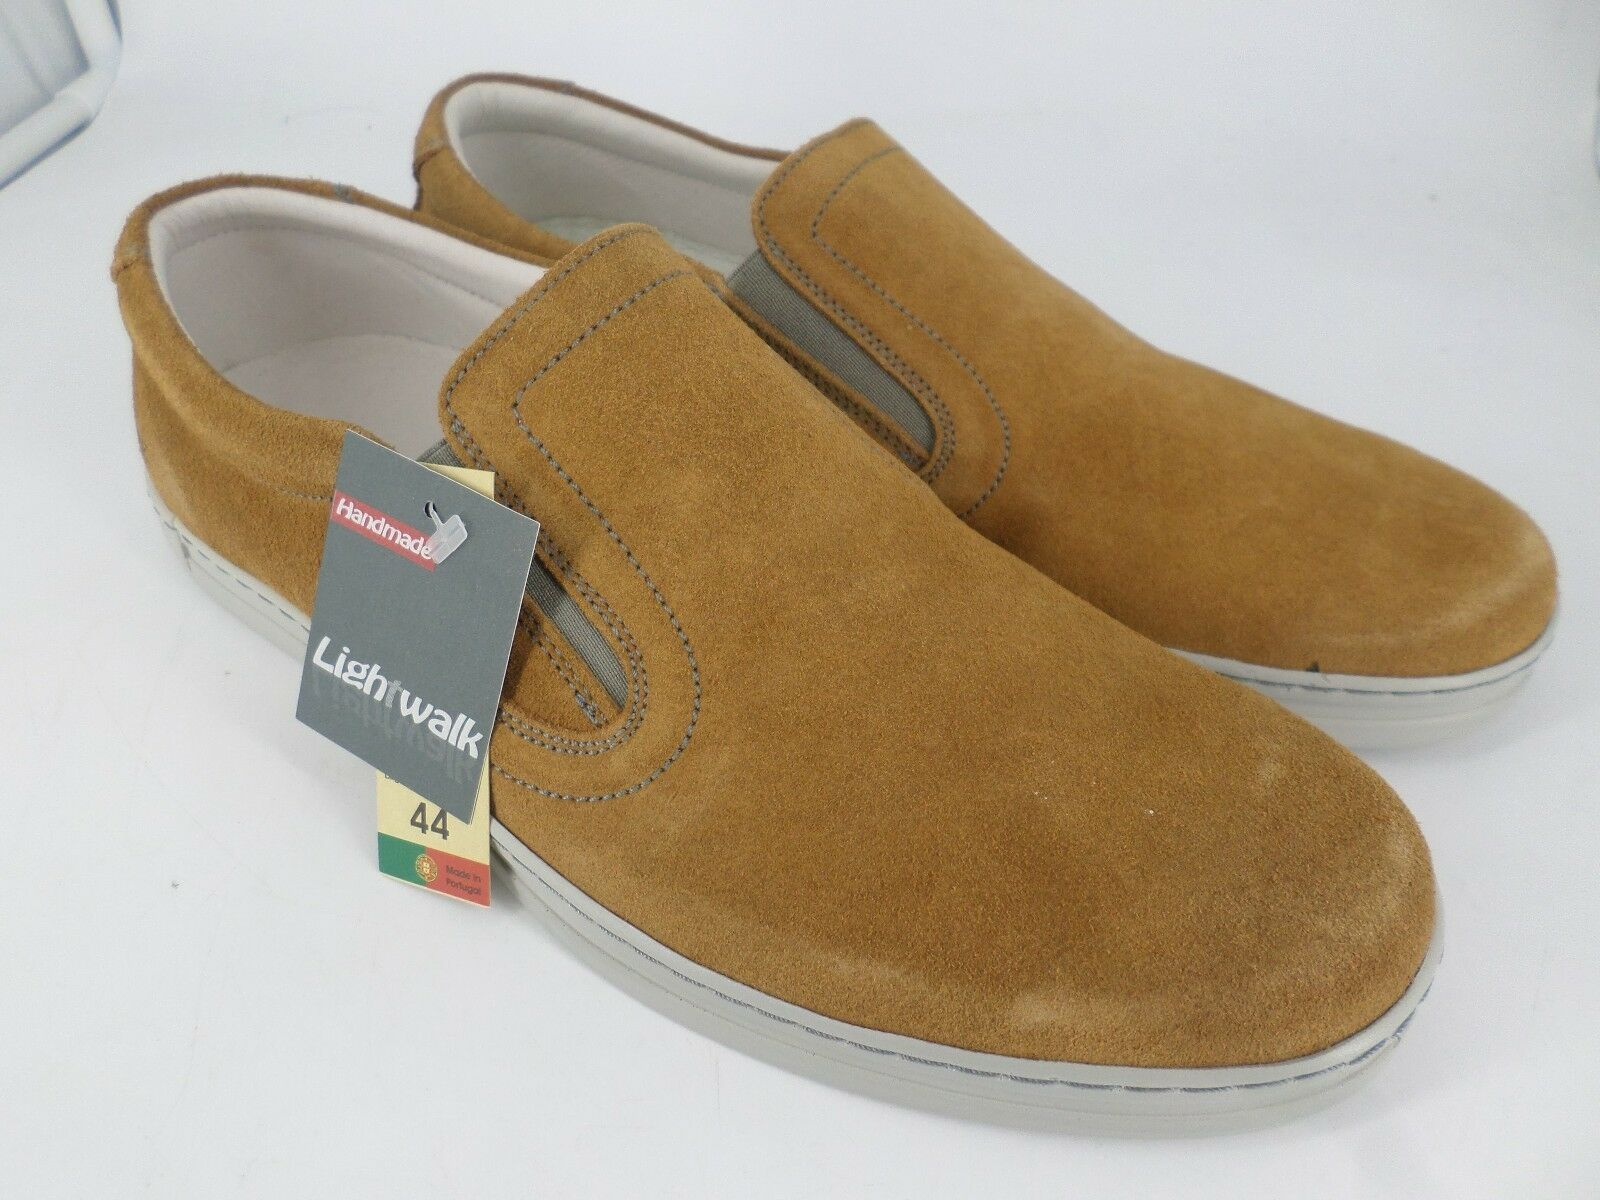 Mens Light Walk Suede Casual shoes LN28 99 SALEs